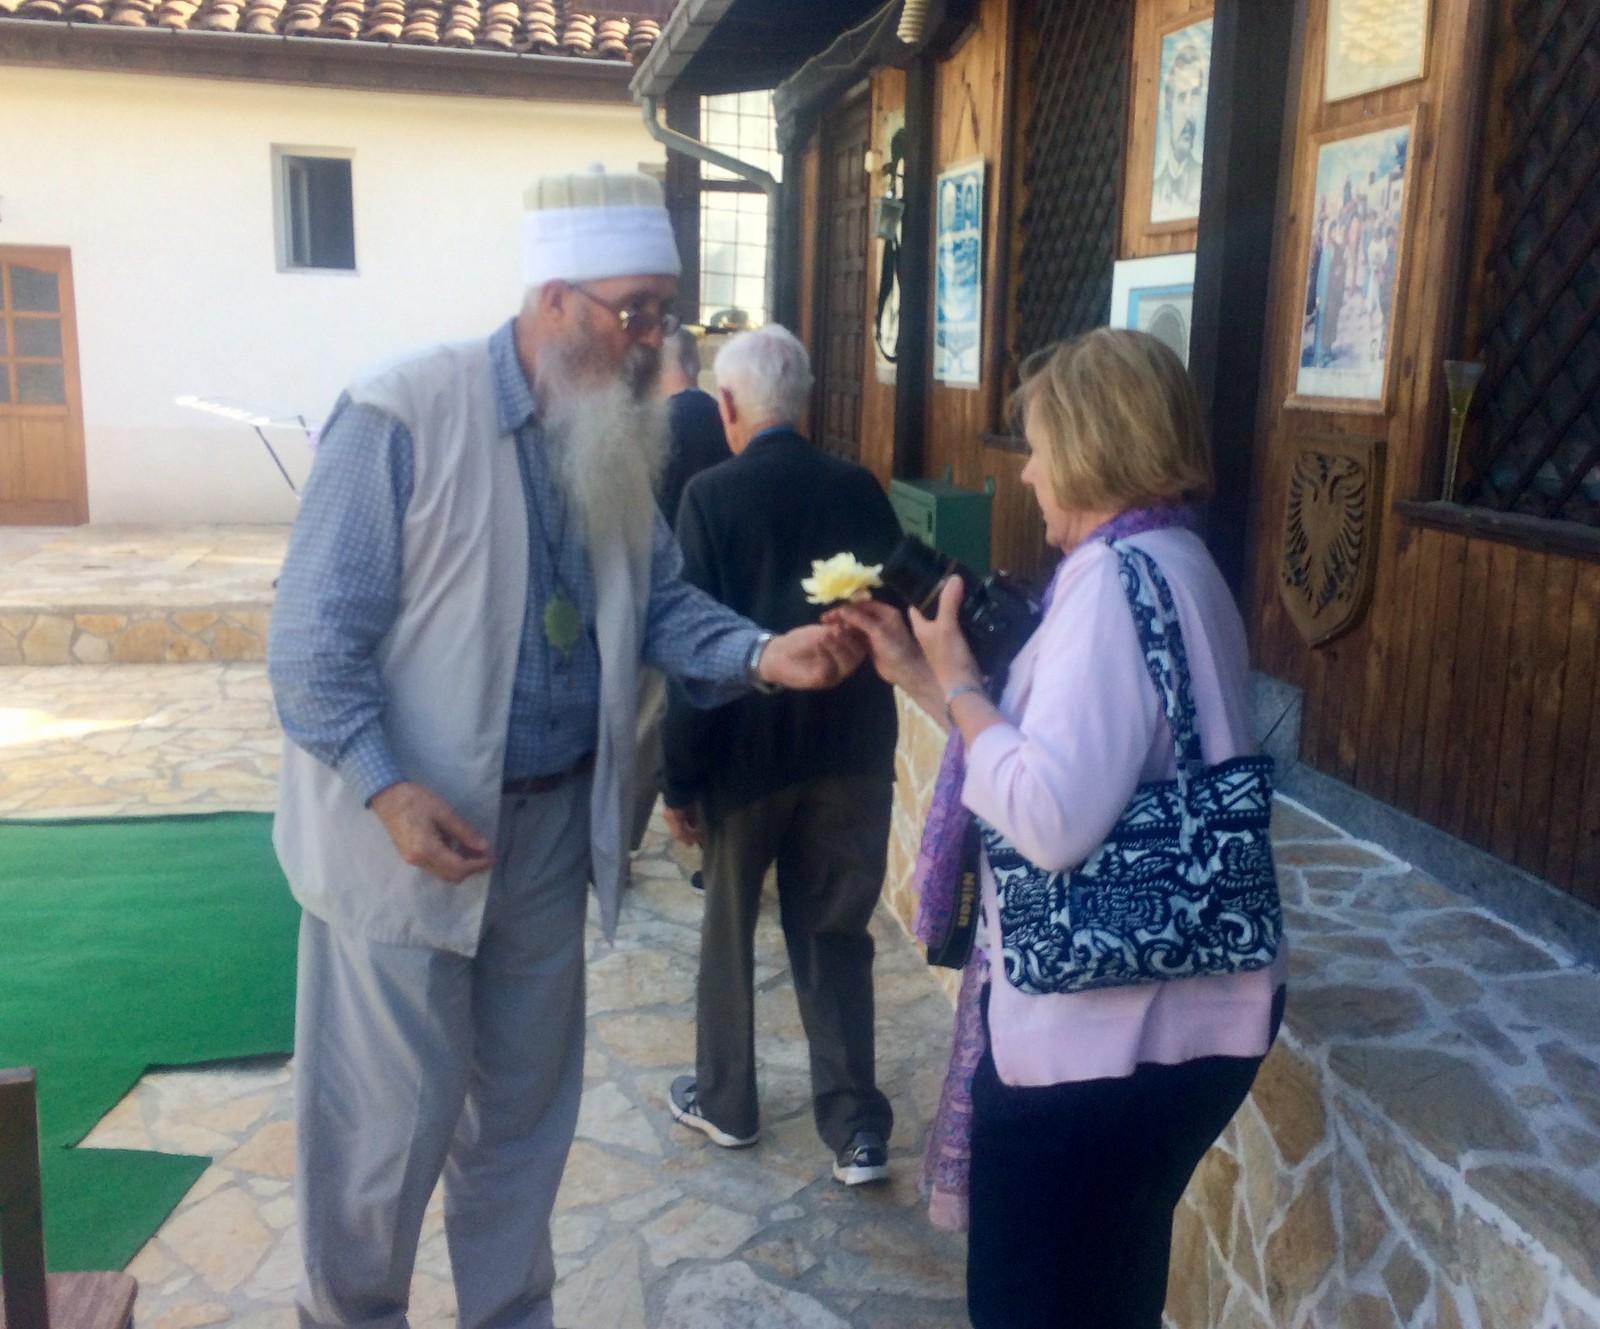 201705 - Arabati Baba Teke Dervish Monastery - Tetovo - Macedonia (FYROM), May 29, 2017